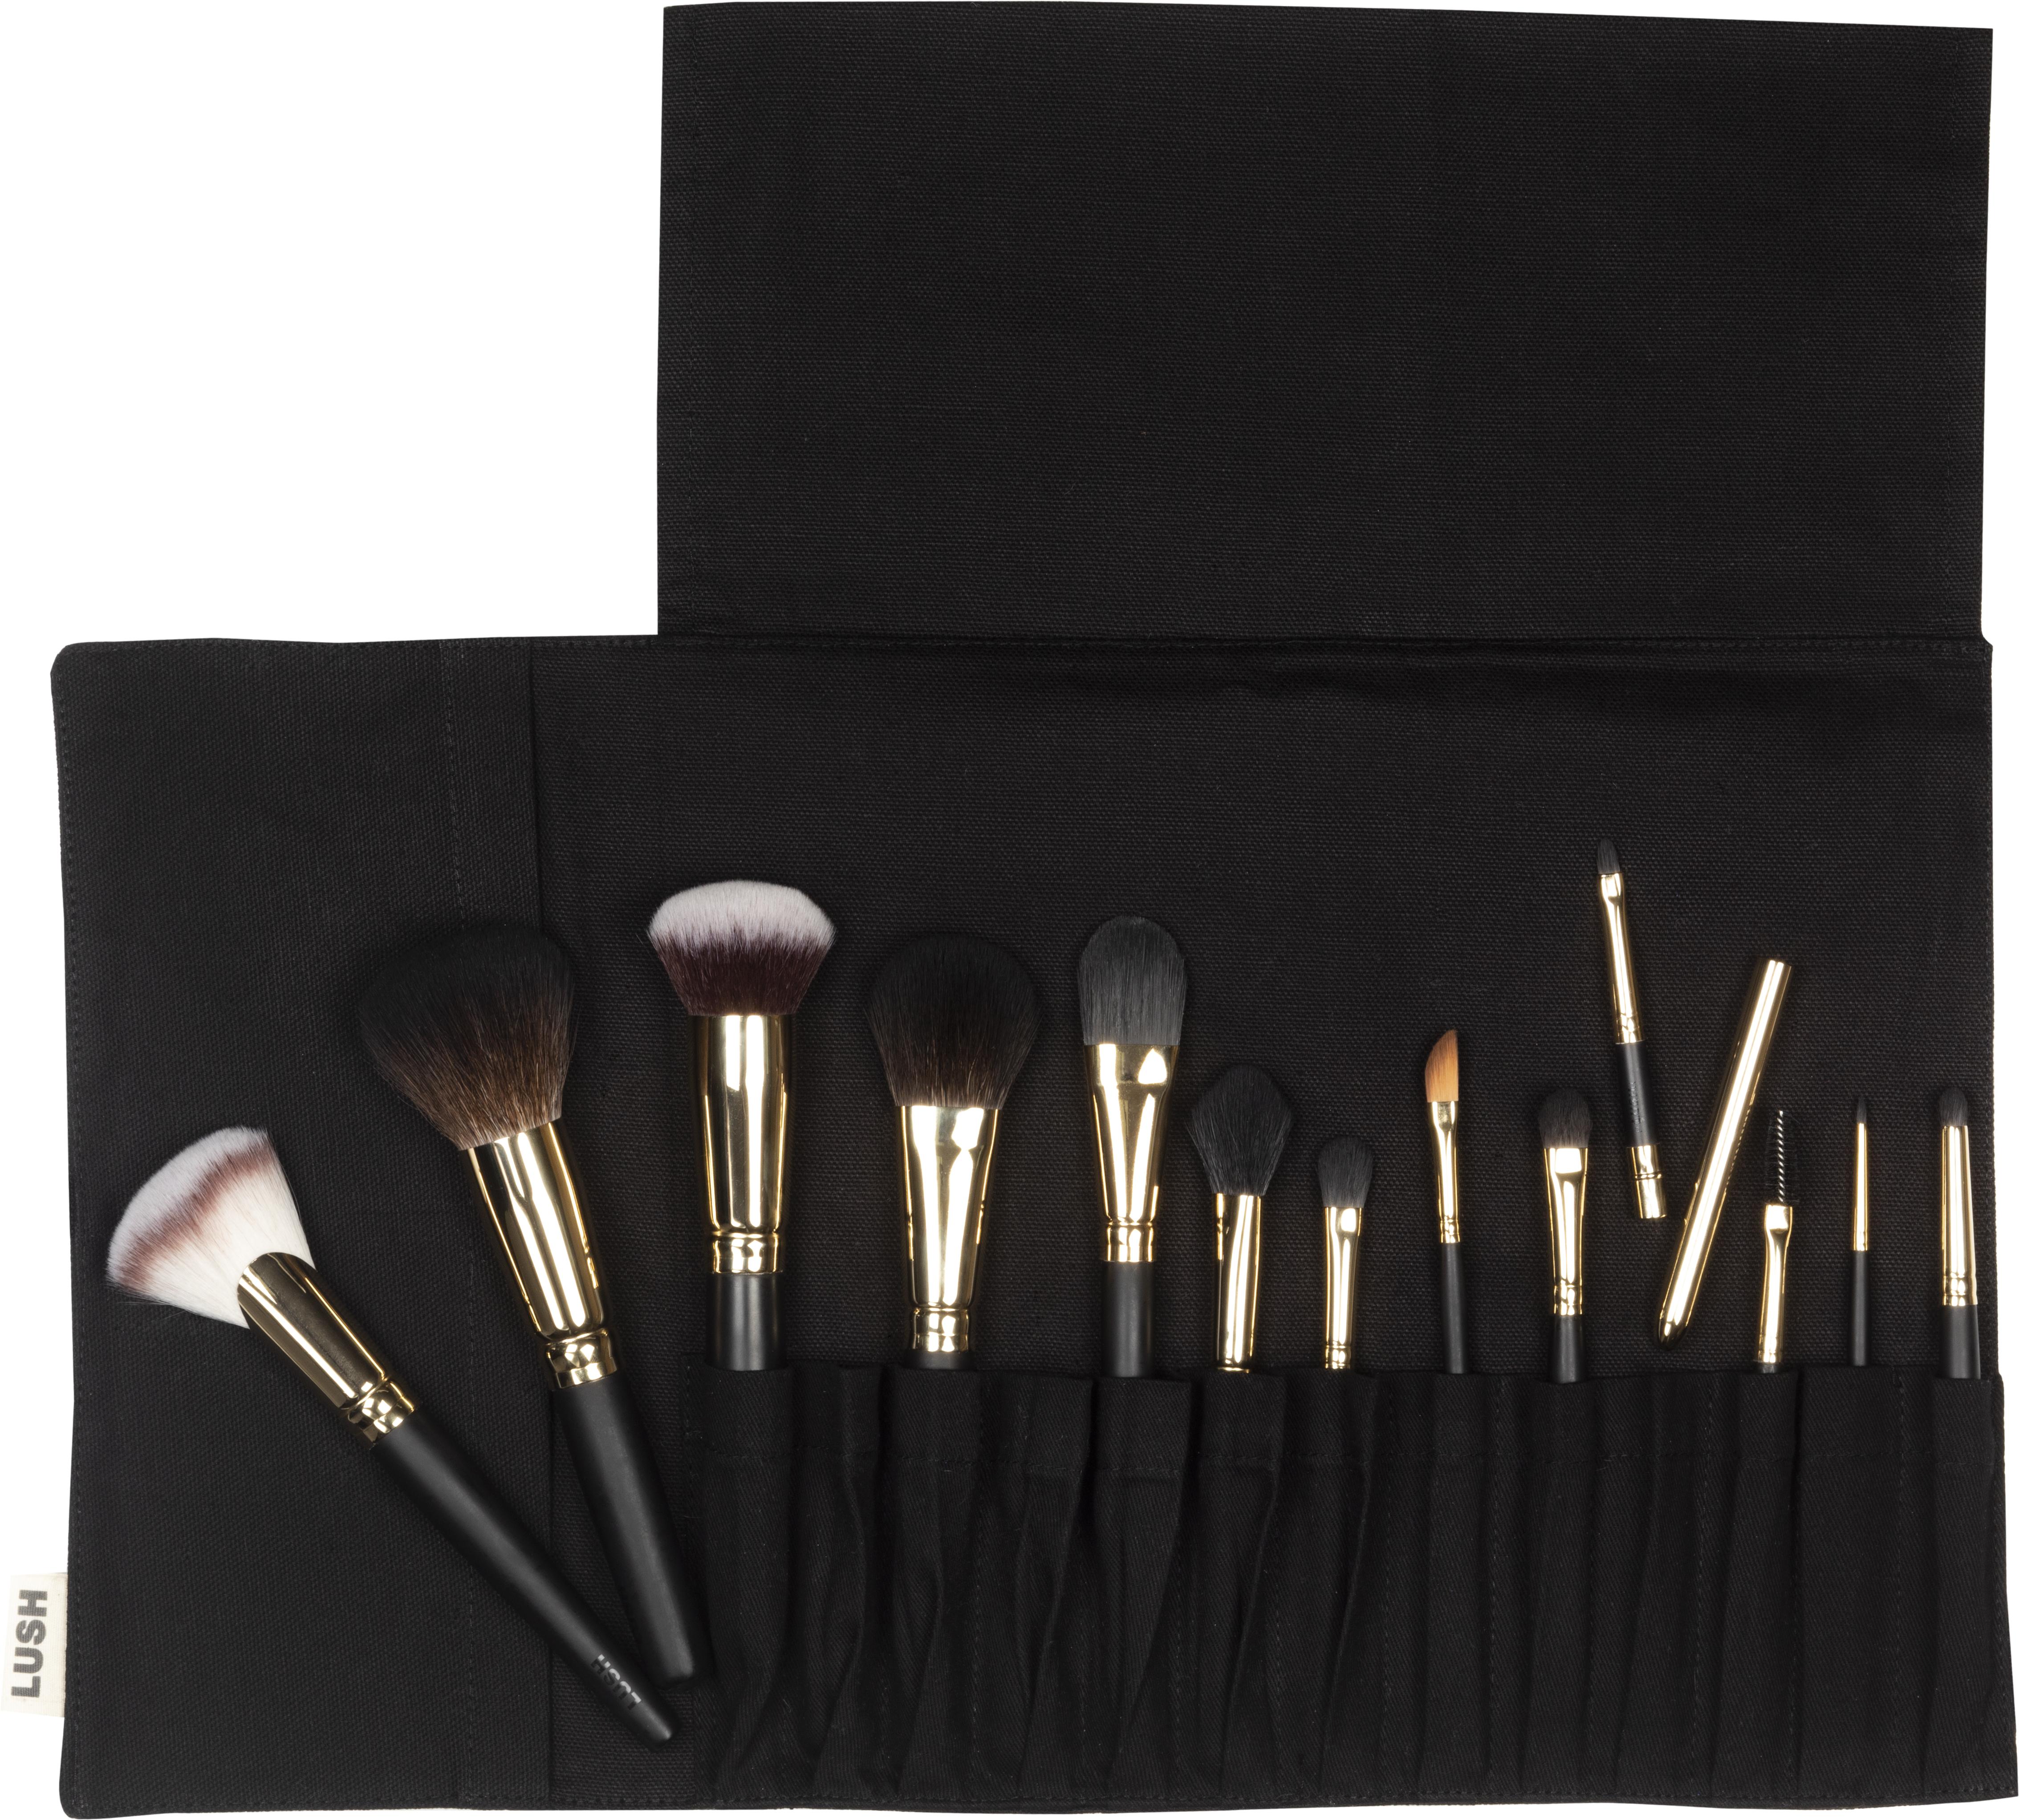 2019 Latest Design Makeup Brushes New Makeup Large Blush Face Powder Foundation Professional Make Up Brush Set Cosmetic Brushes Beauty & Health